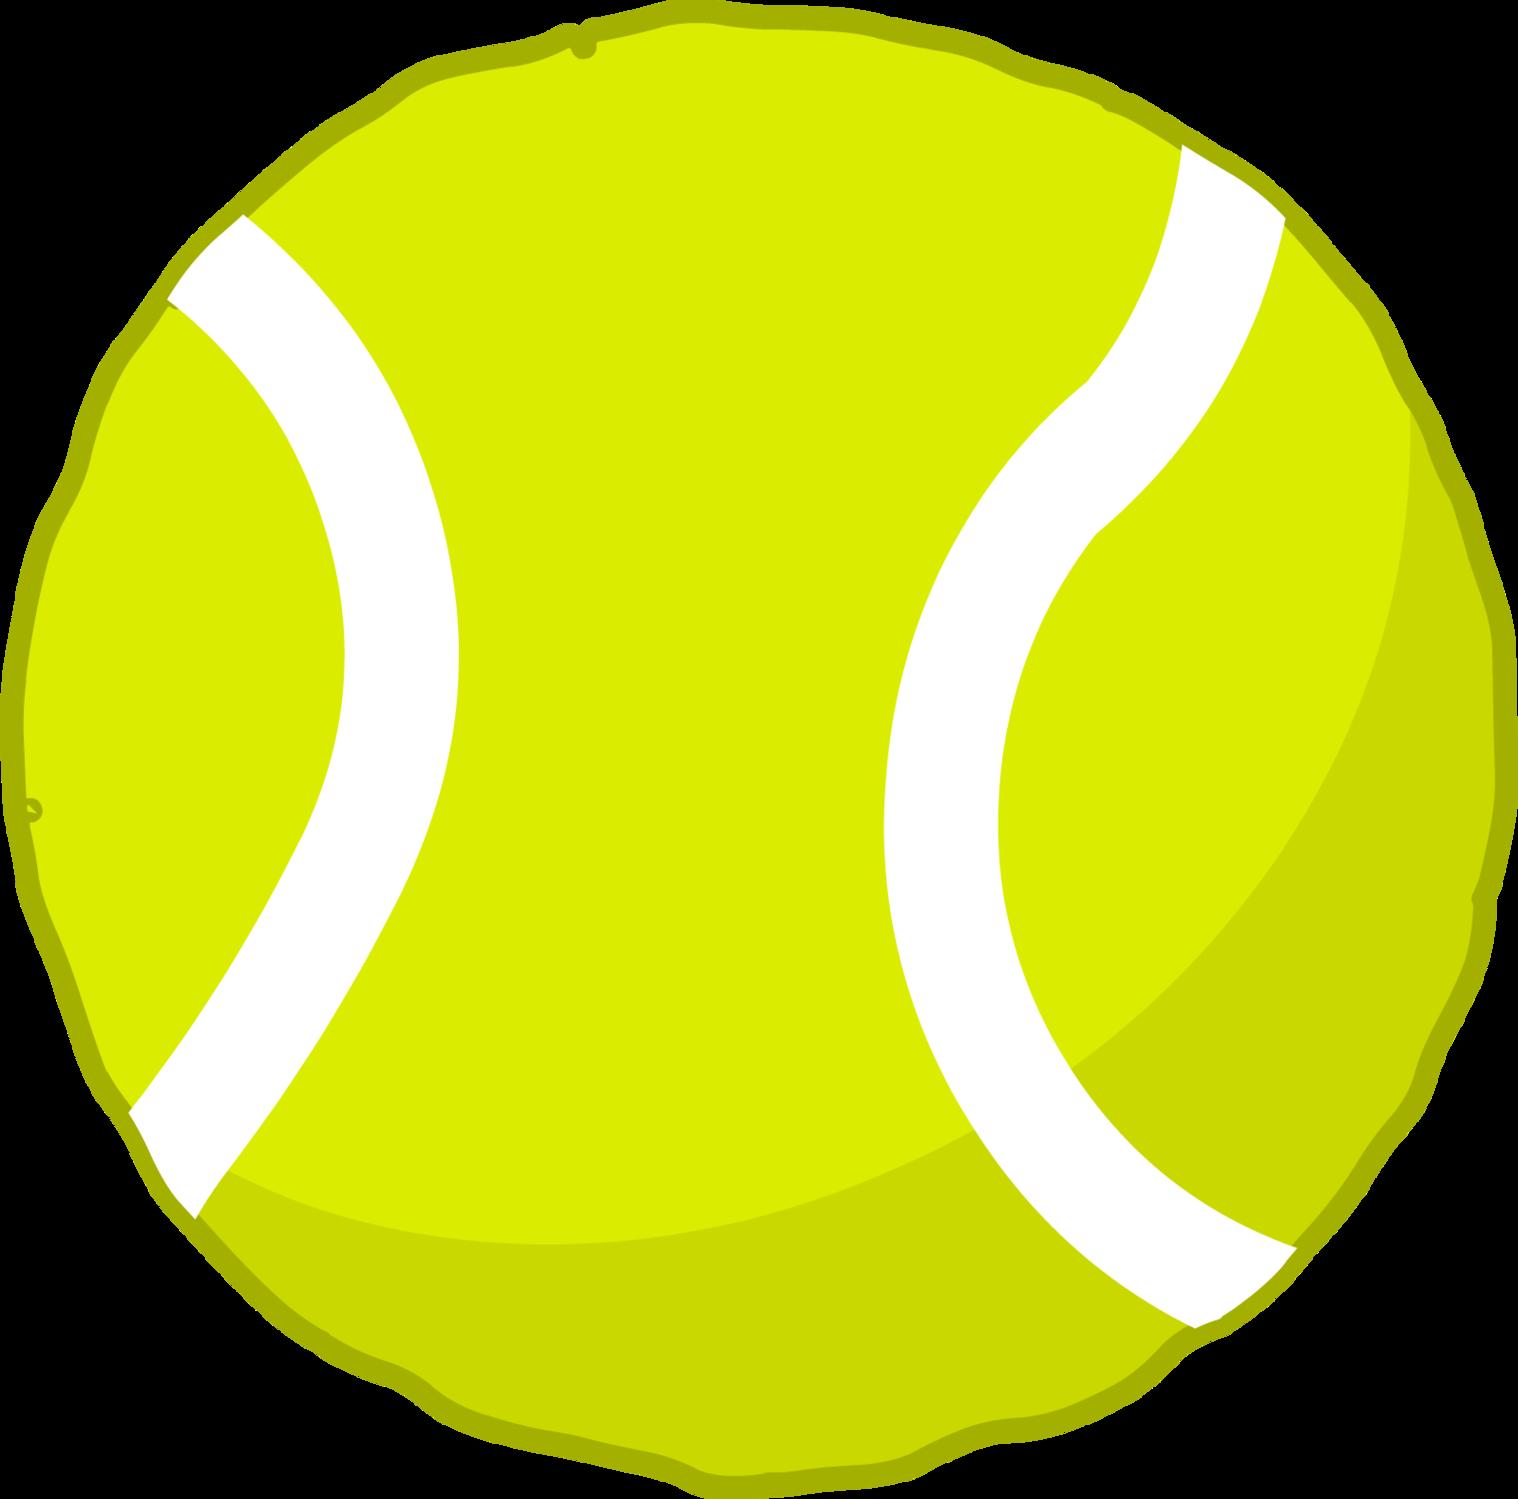 Tennis Ball clipart Ball clipart Clipartix tennis Picture